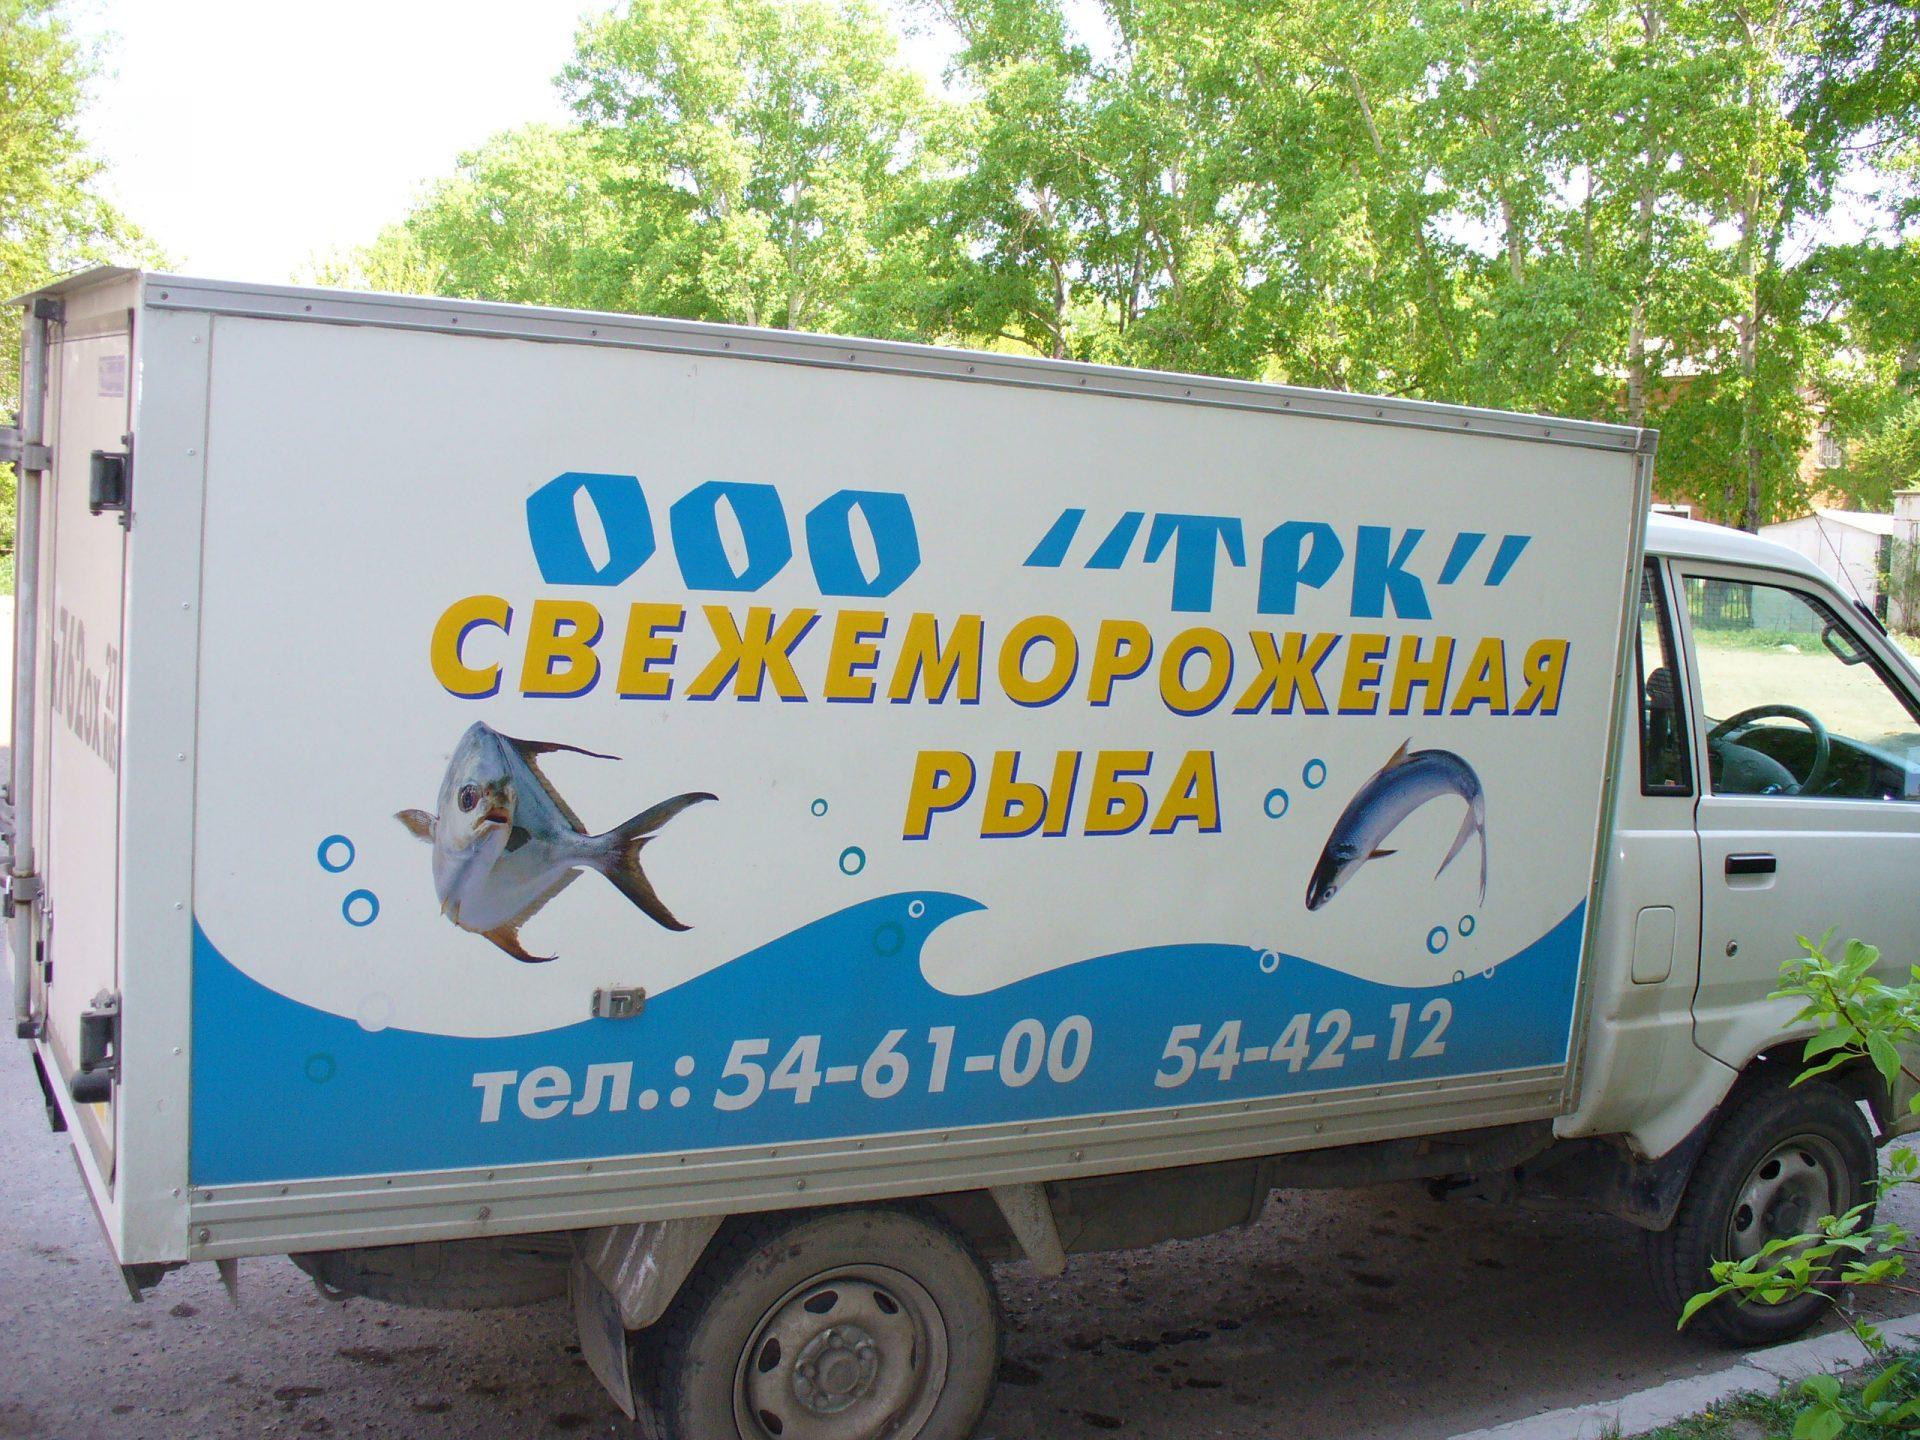 ТРК, свежемороженая рыба